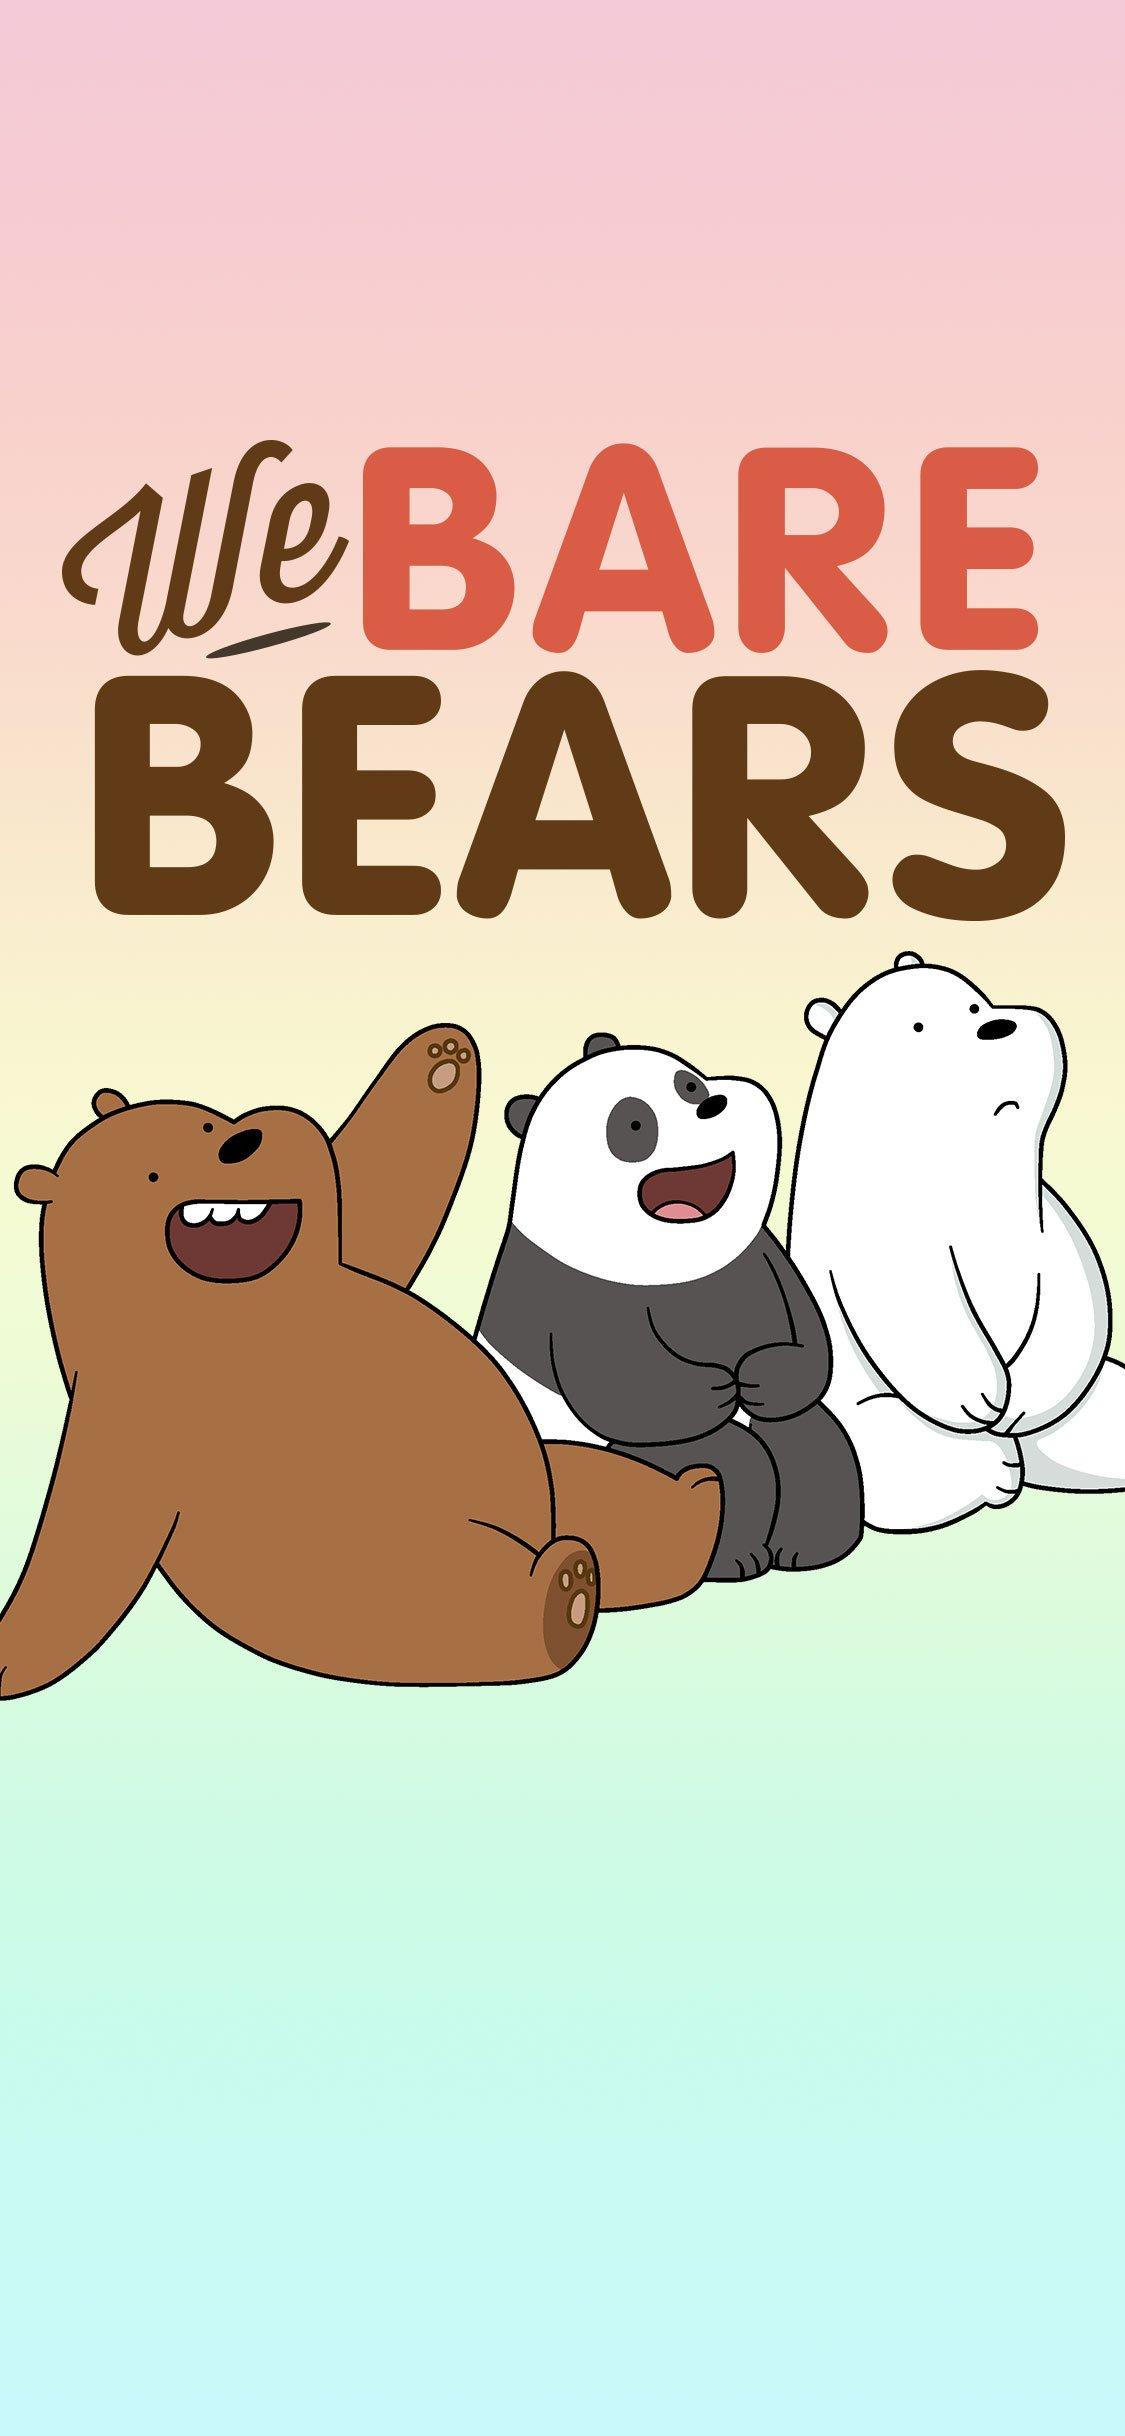 We Bare Bears samsung iphone google pixel Wallpapers 6